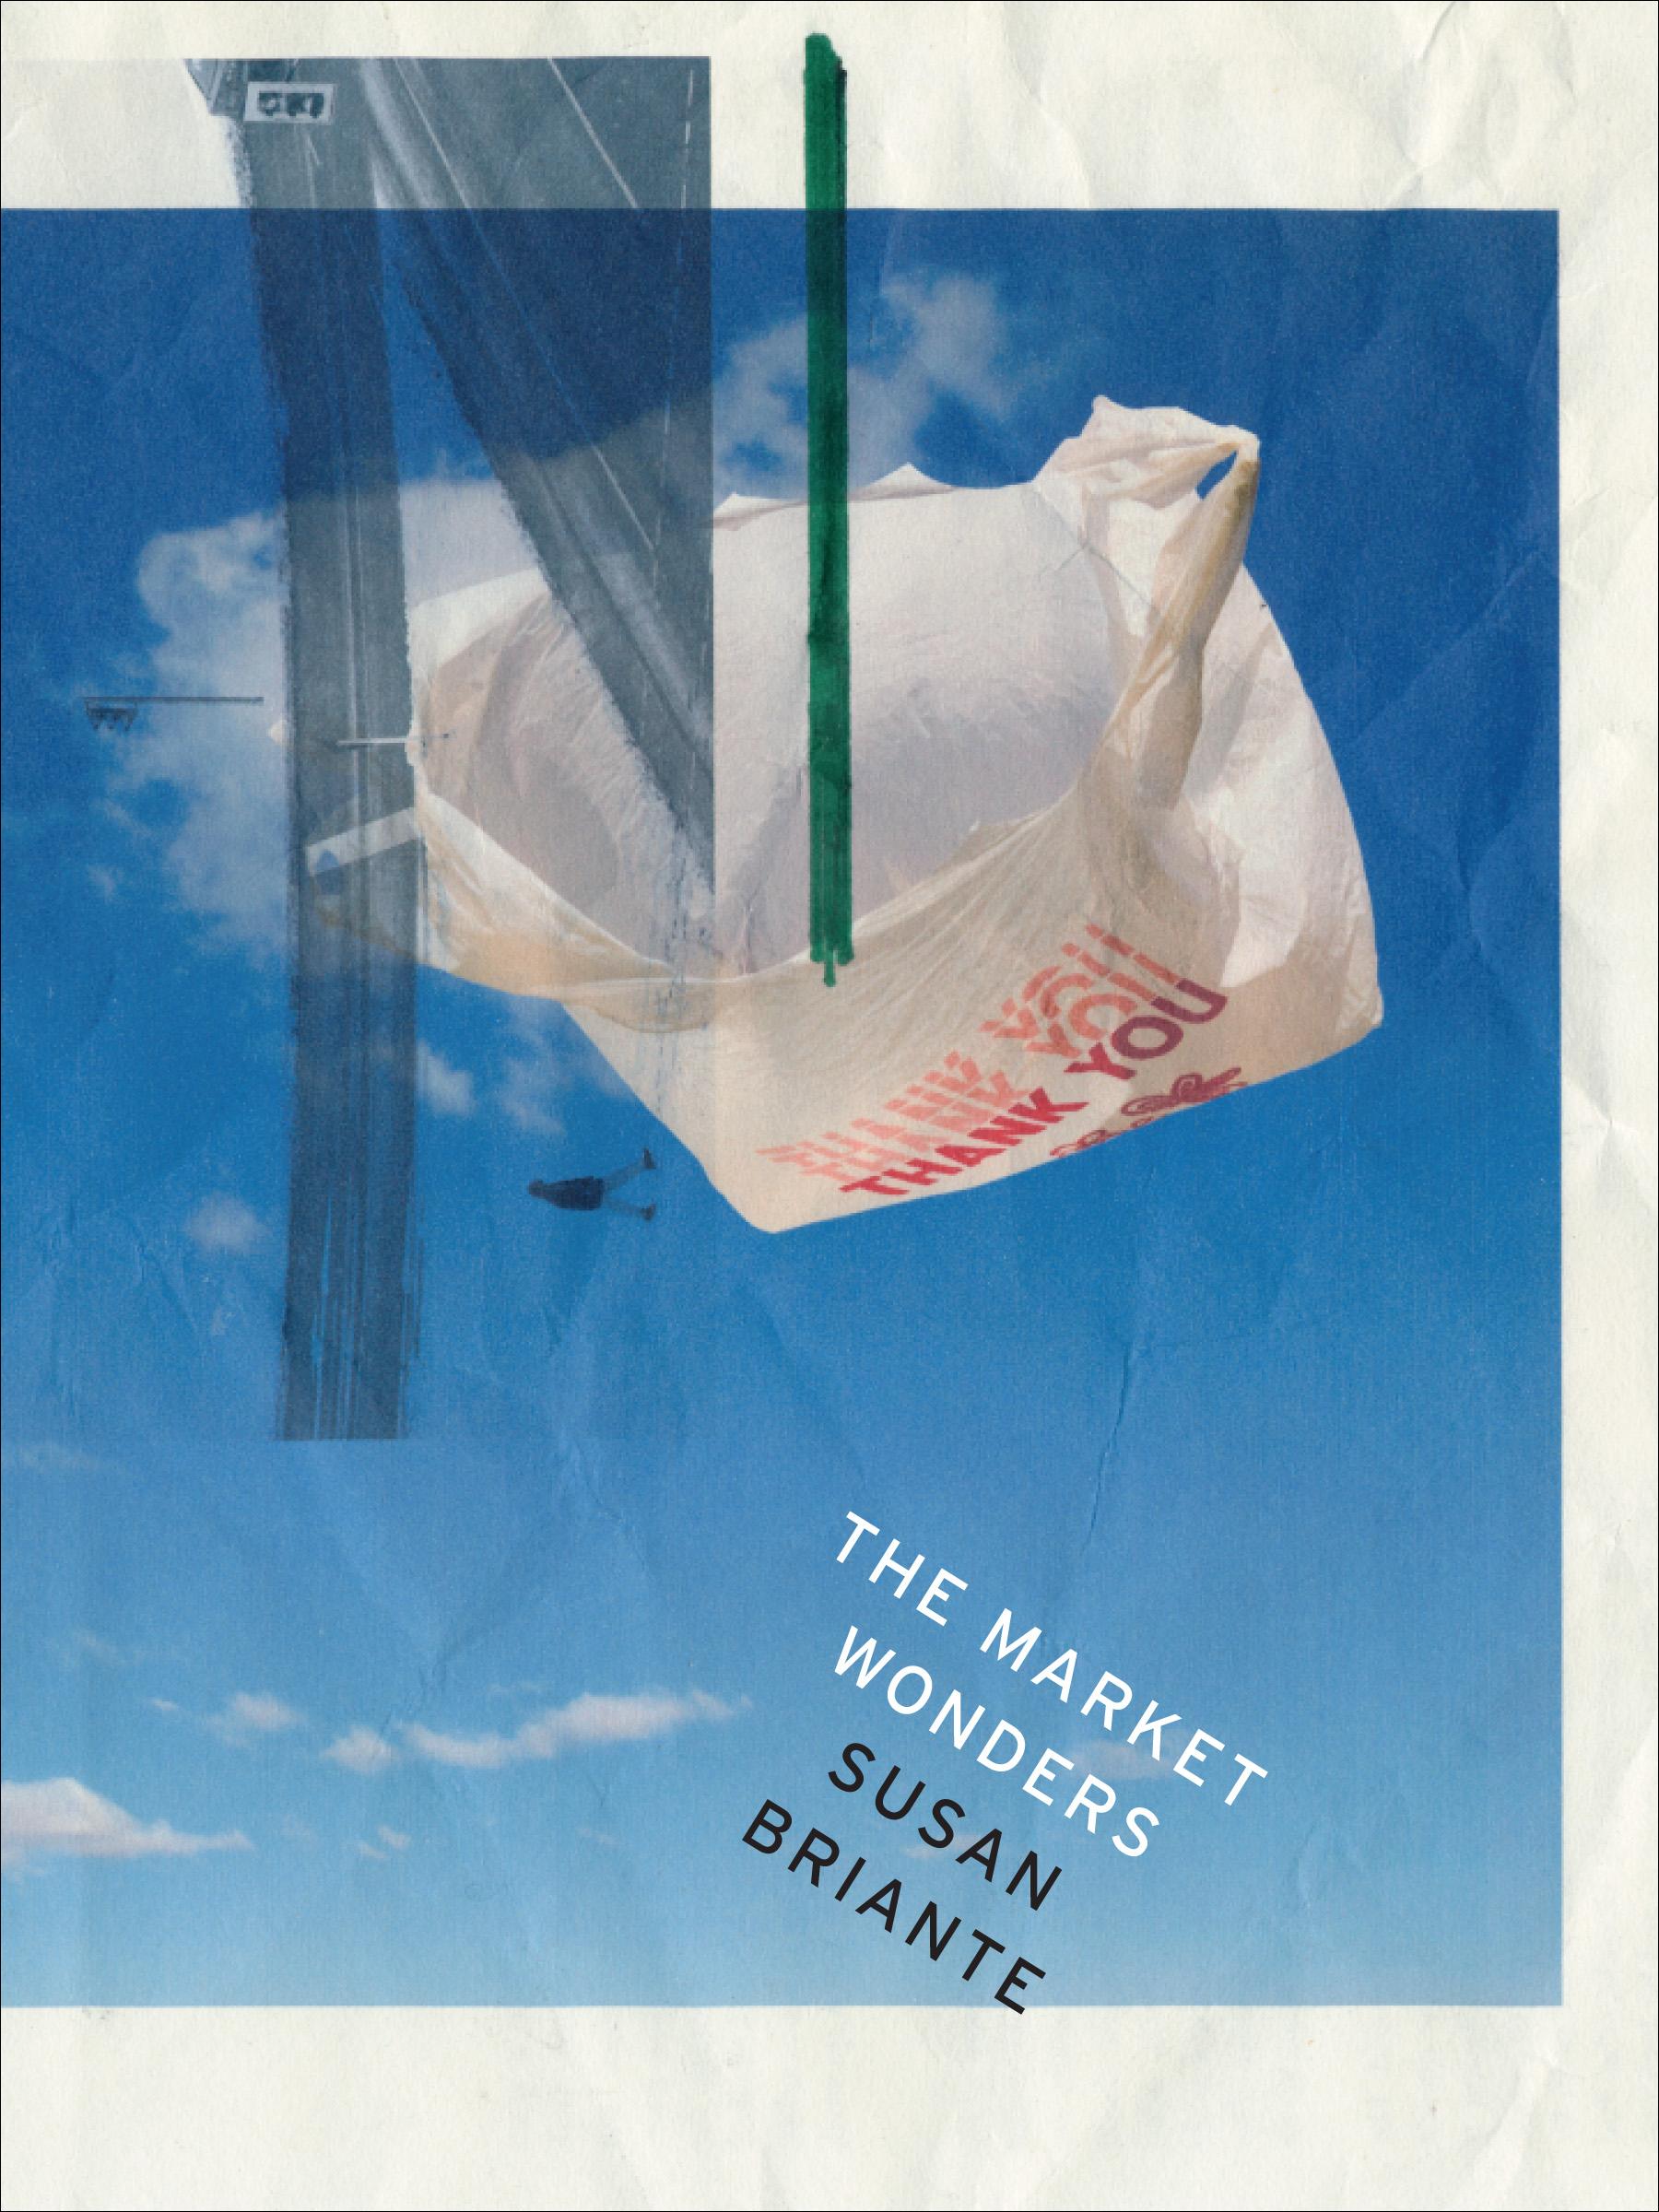 The Market Wonders  - a poem by Susan Briante